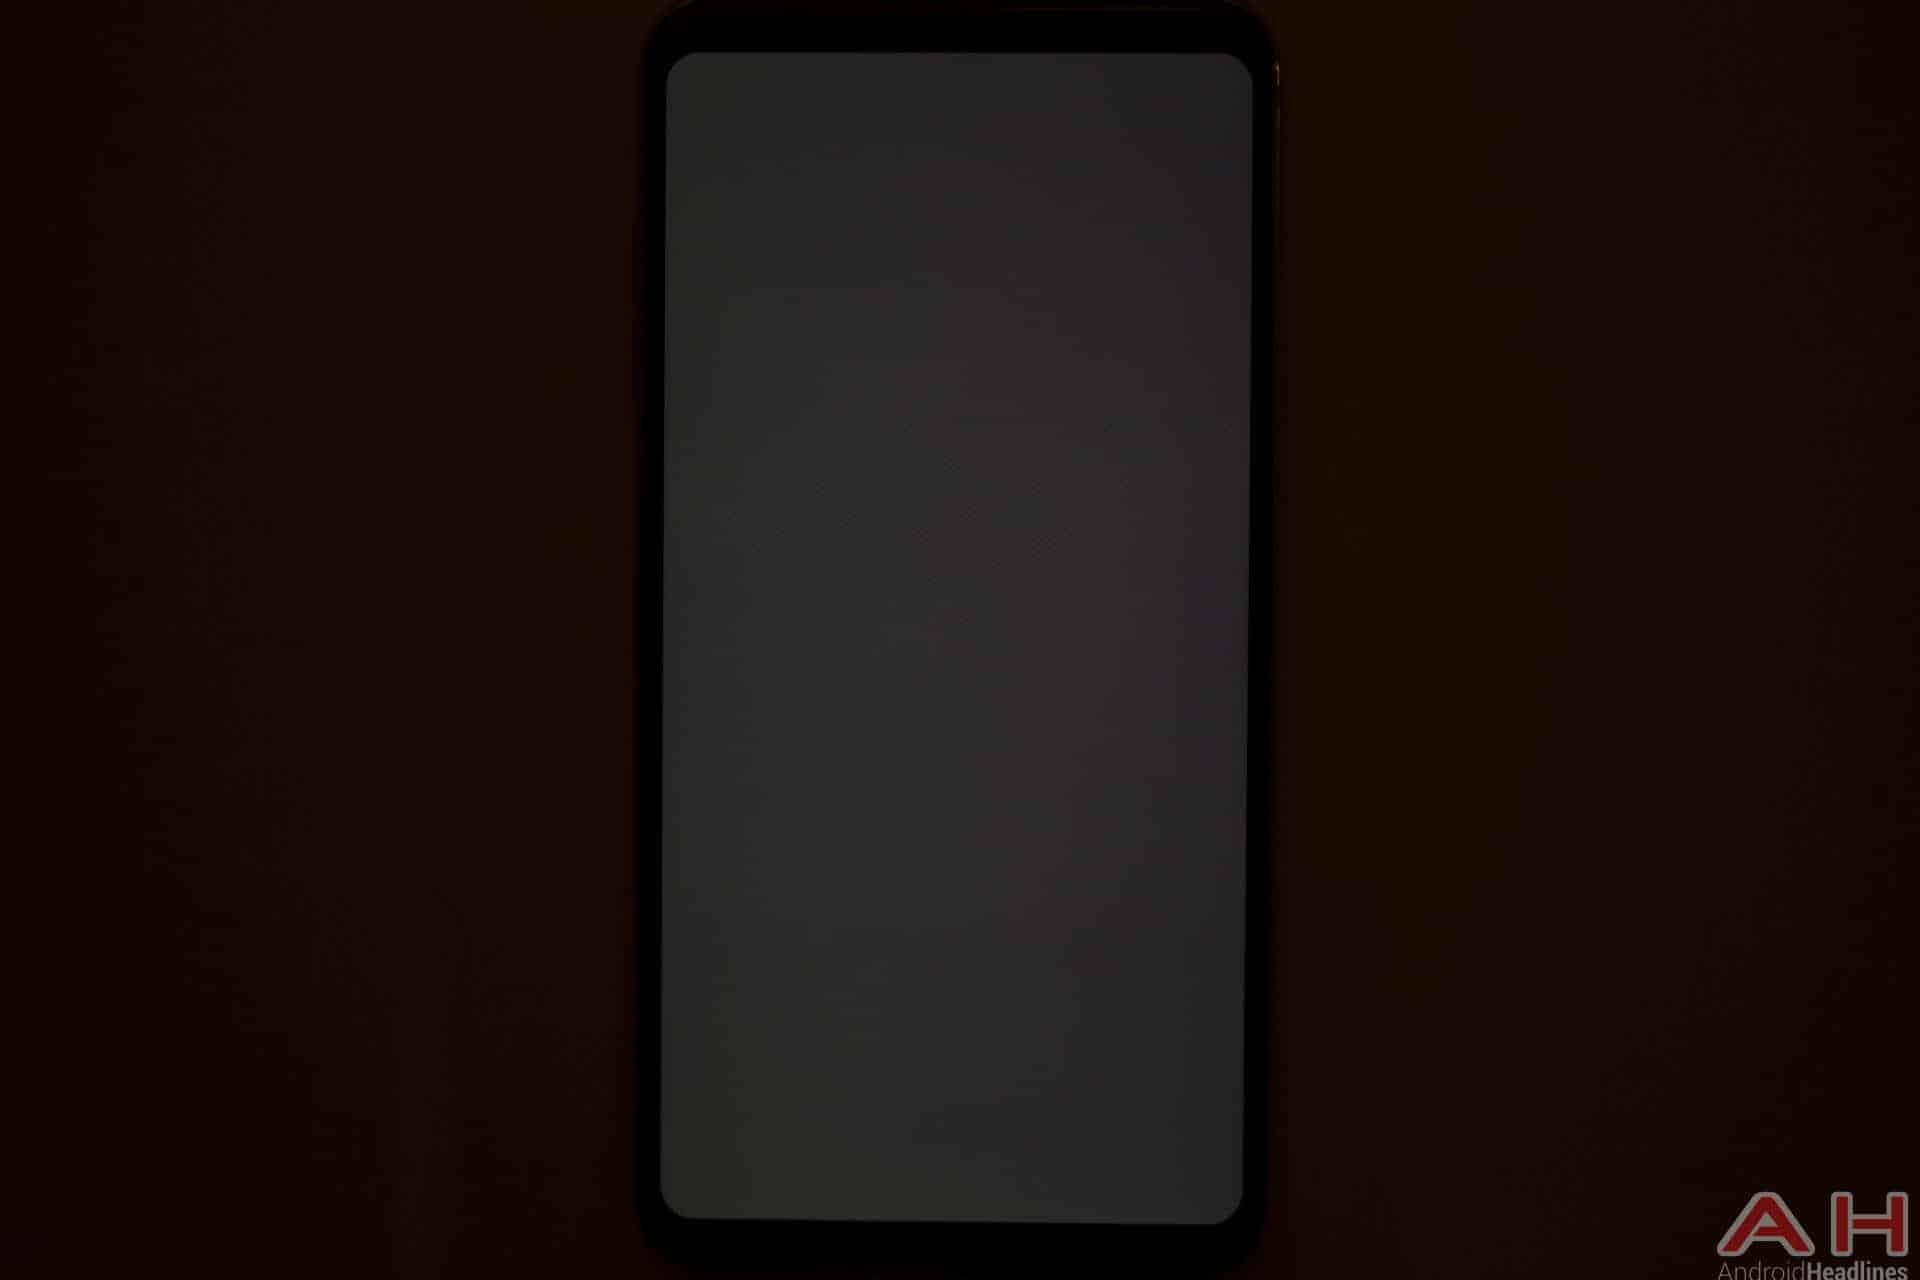 LG V30 AH NS Display Uniformity Grey 0